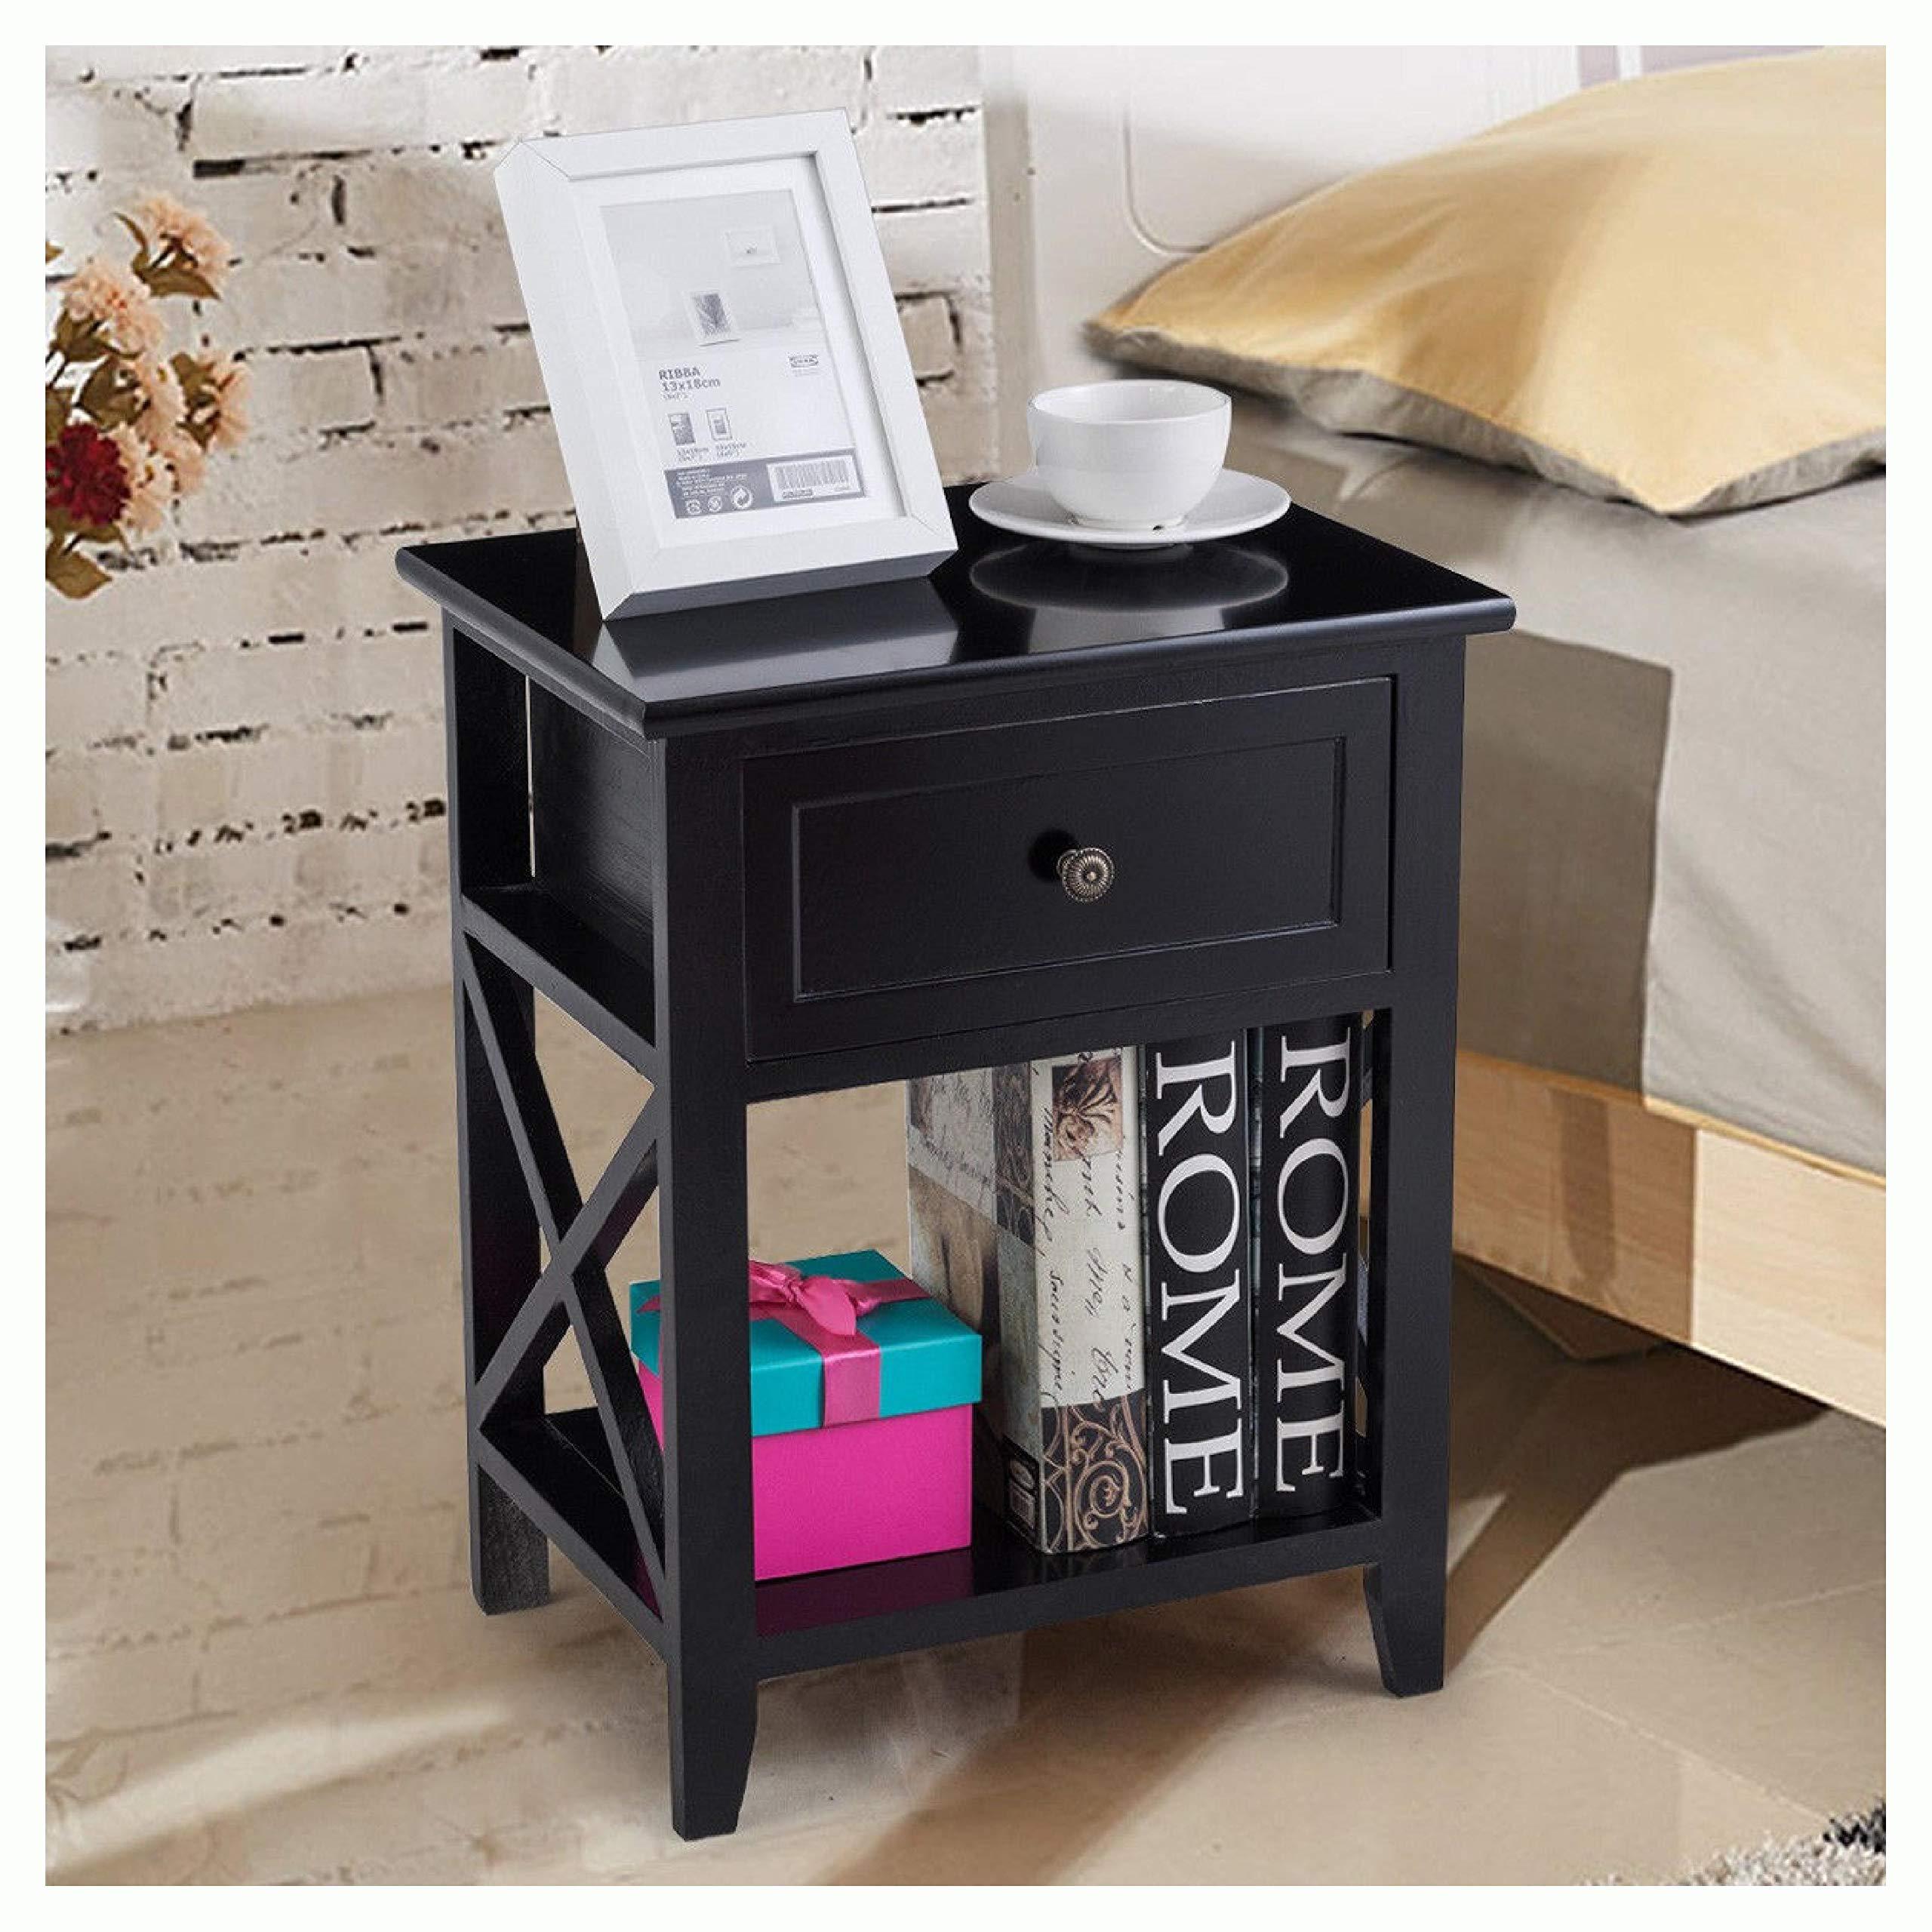 Nightstand, Bedside Storage Nightstand with Drawer and Bottom Shelf, Black